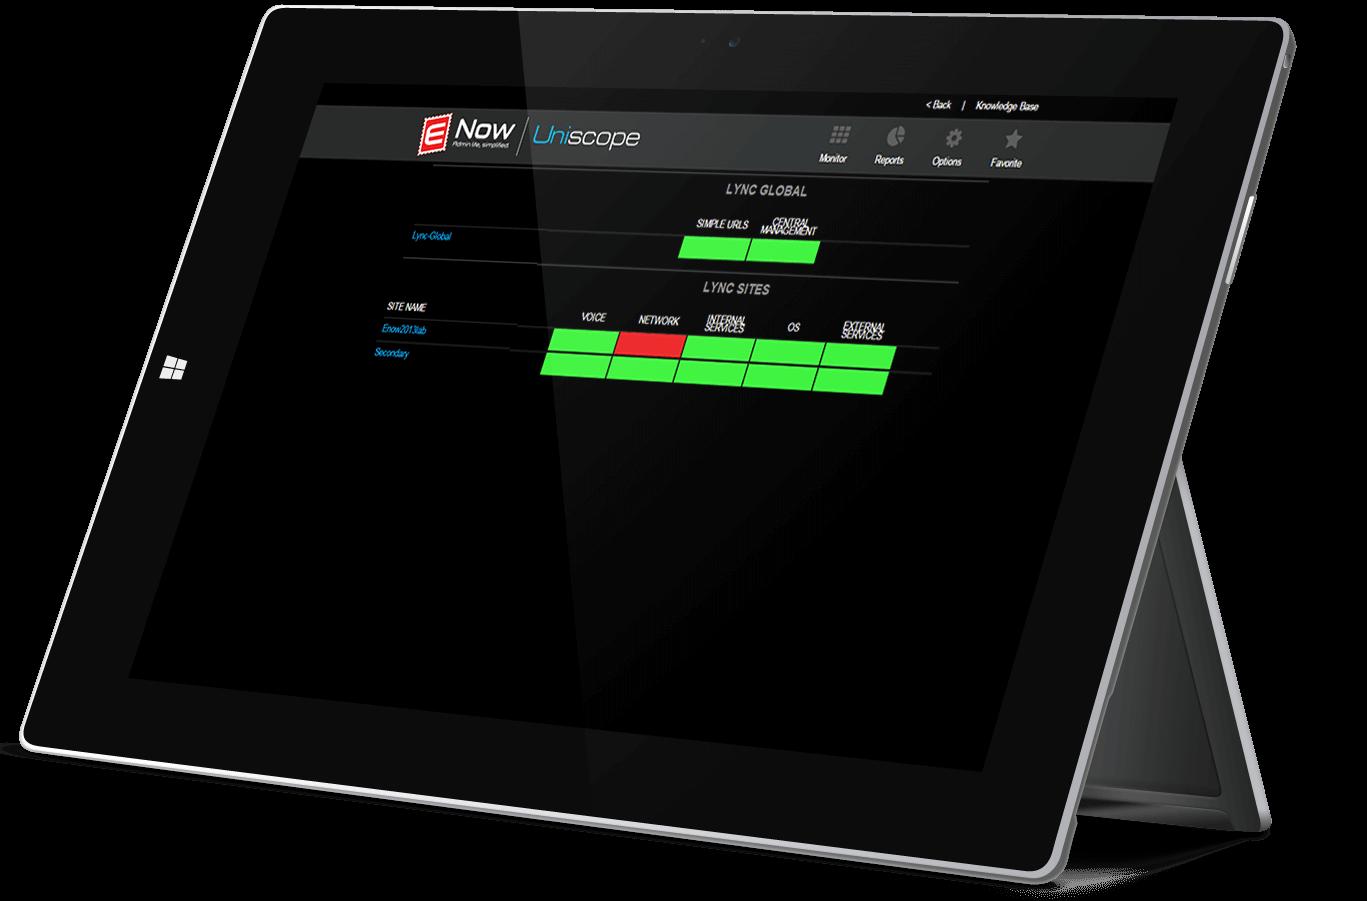 lync skype business monitoring reporting expired certificate error dashboard